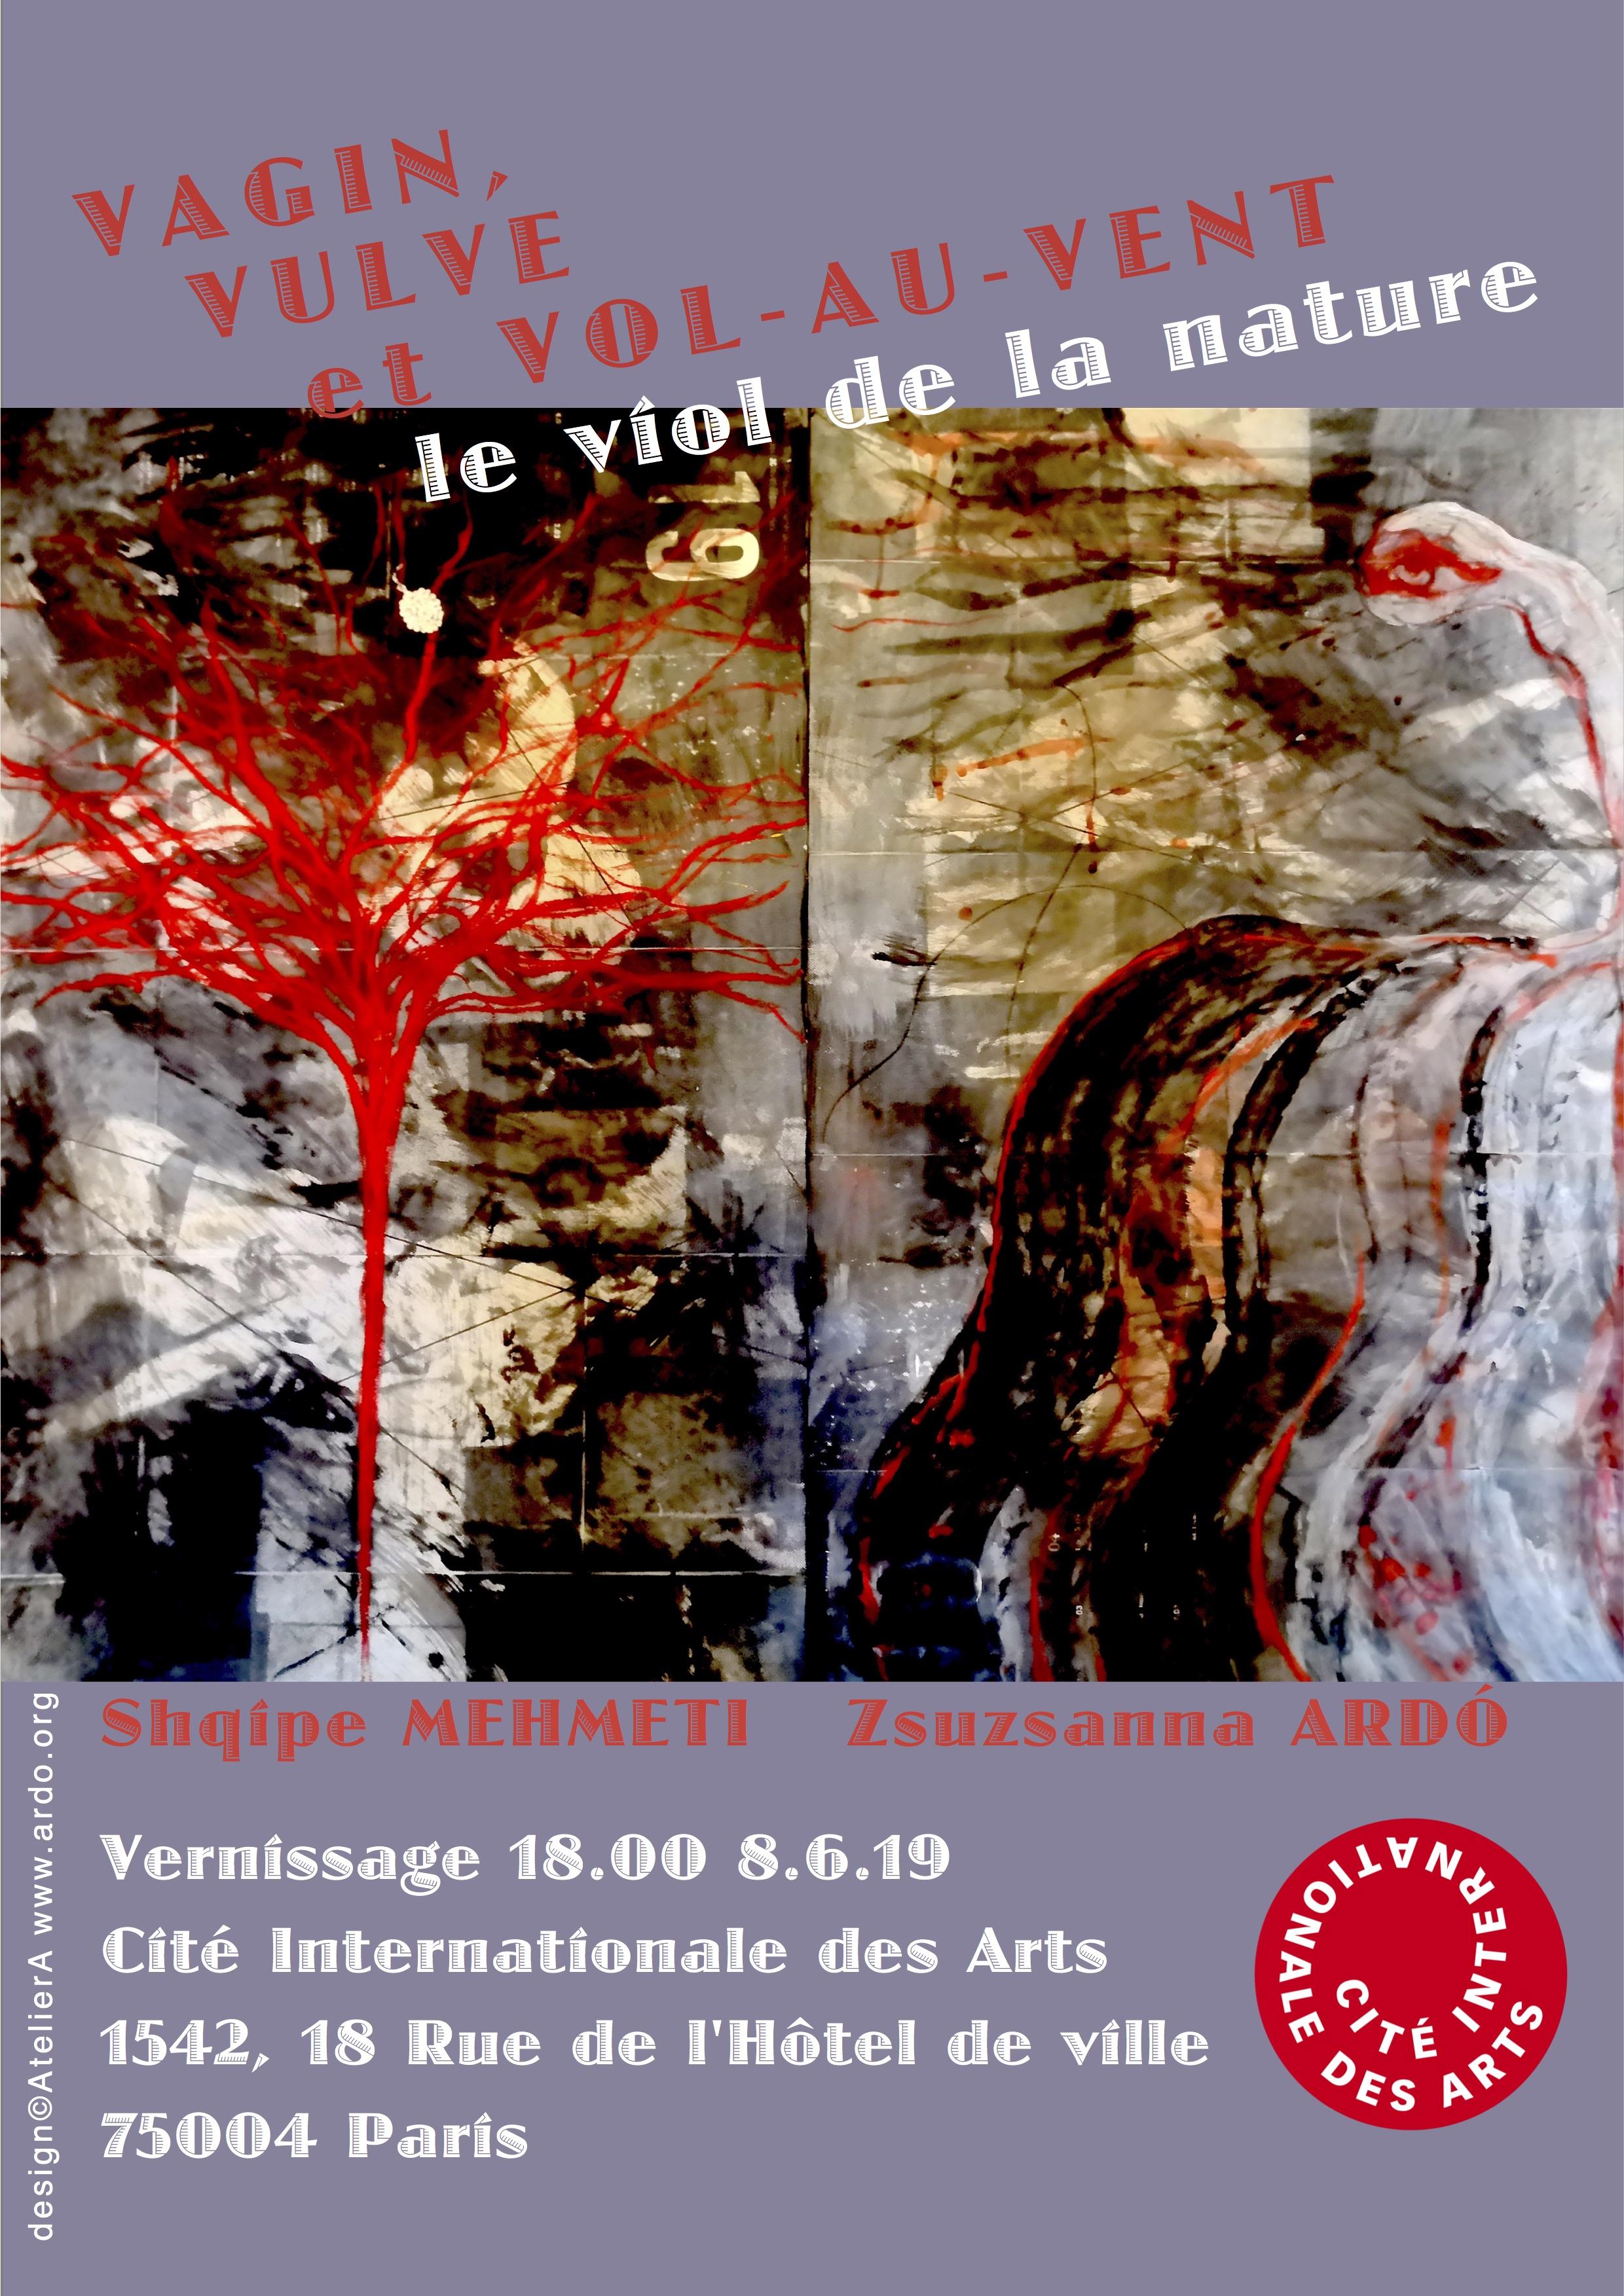 19 FR Paris Citedesart Expo poster wLOGO©ARDO.jpg